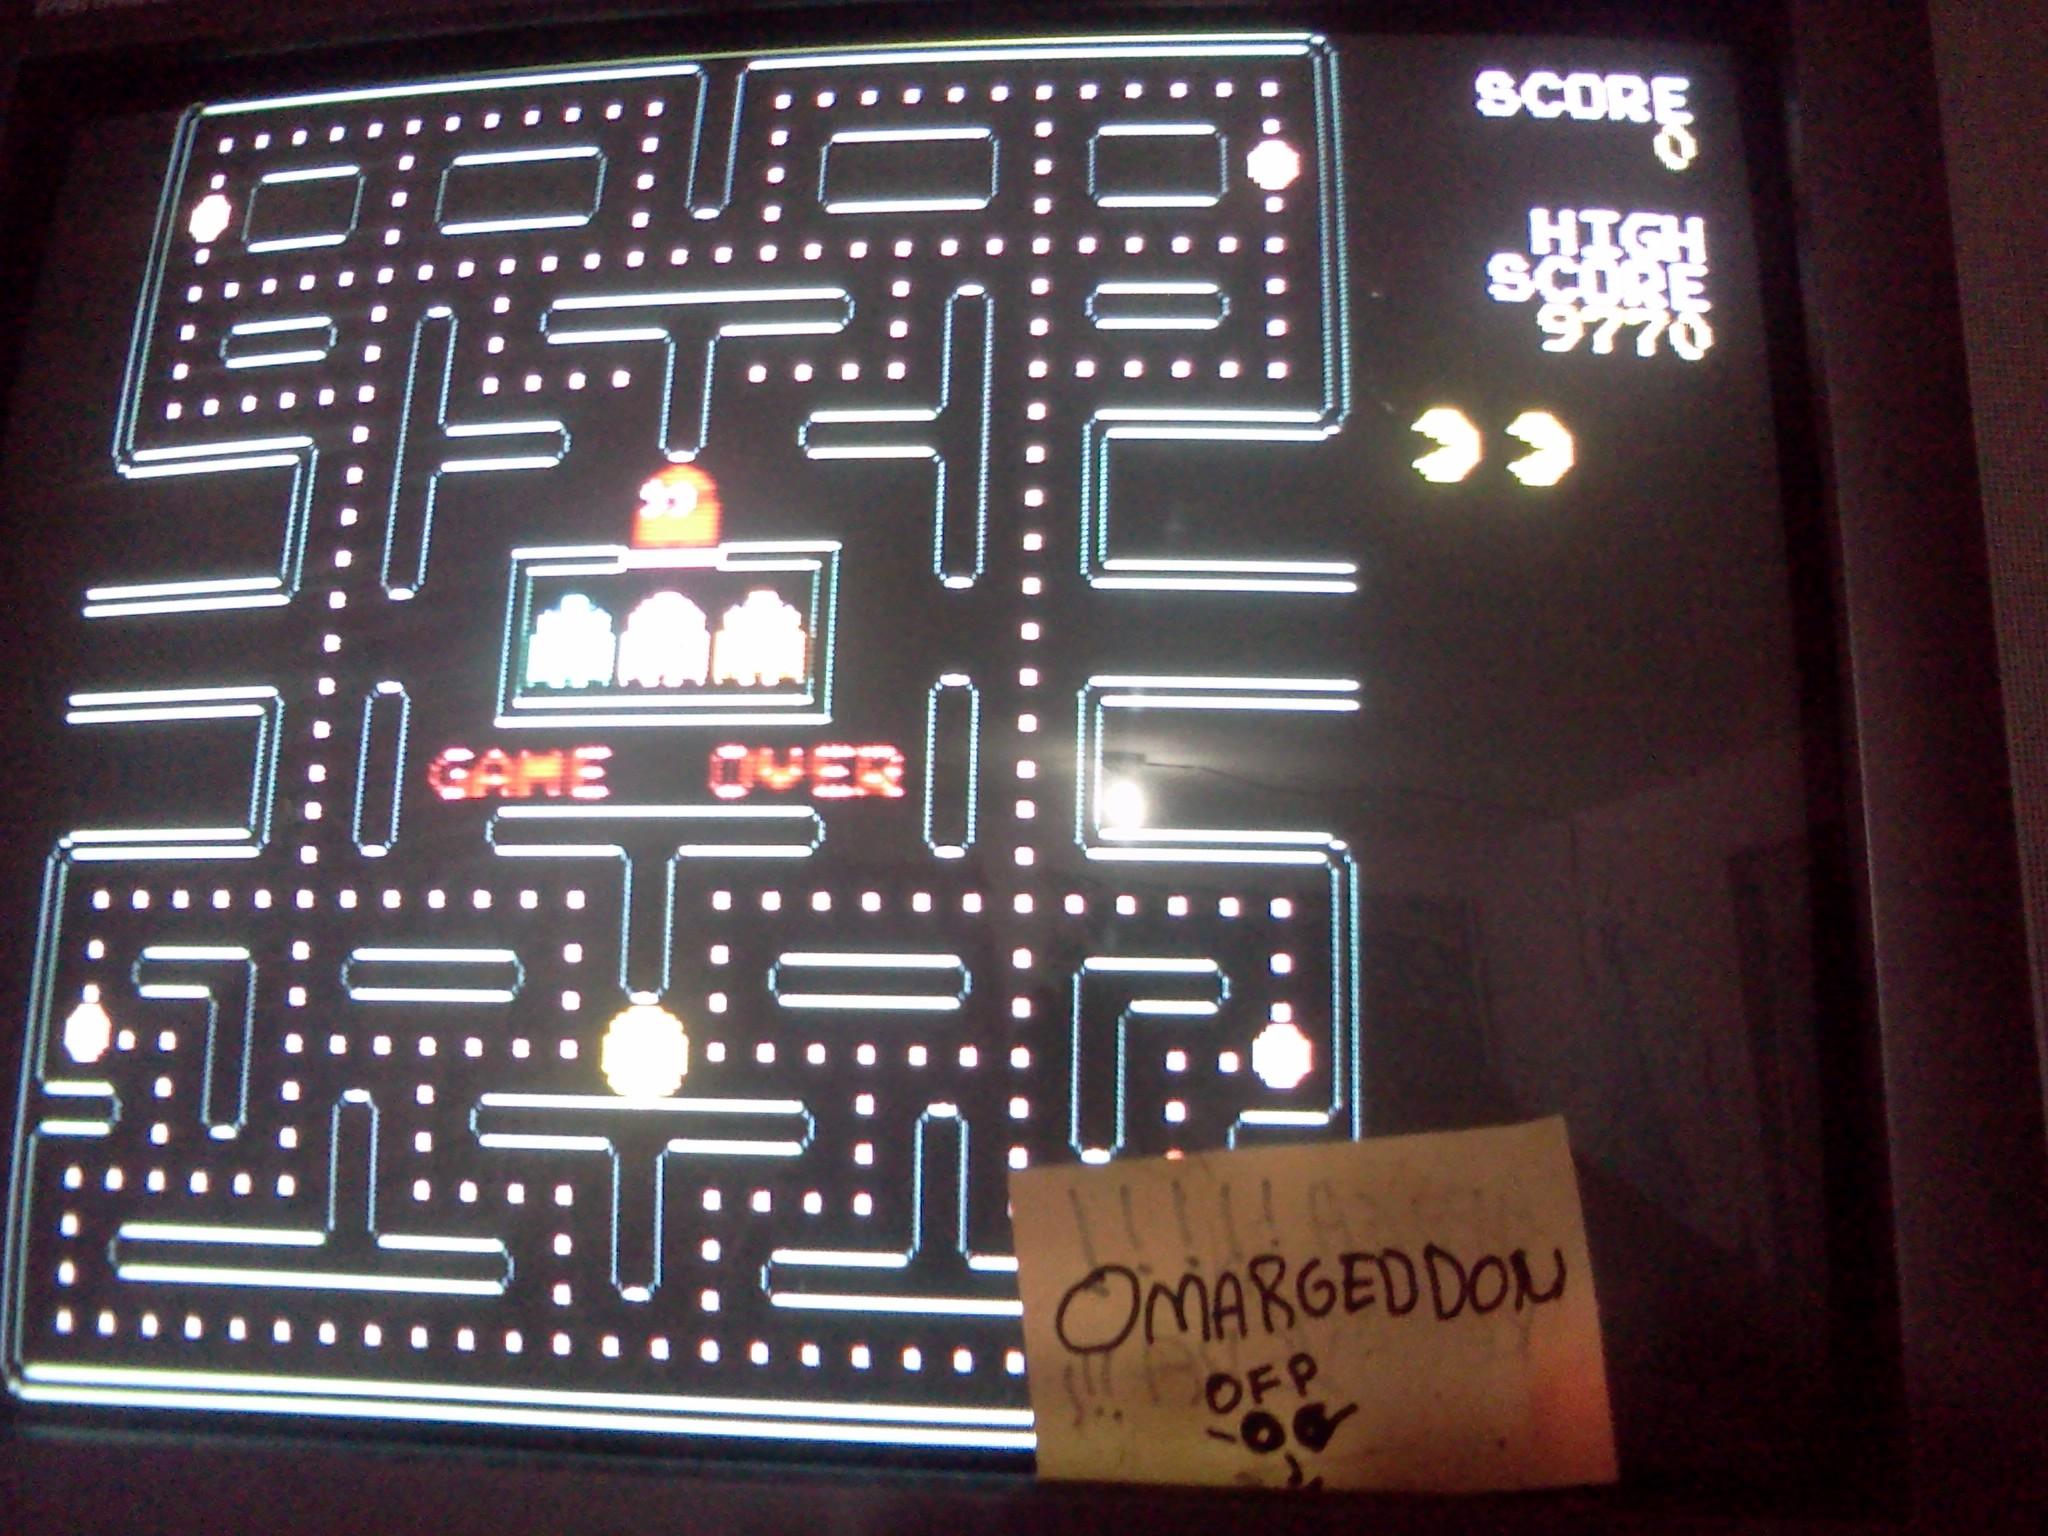 omargeddon: Pac-Man Plus (Jakks Pacific Retro Arcade Pac-Man) 9,770 points on 2016-07-24 00:28:46